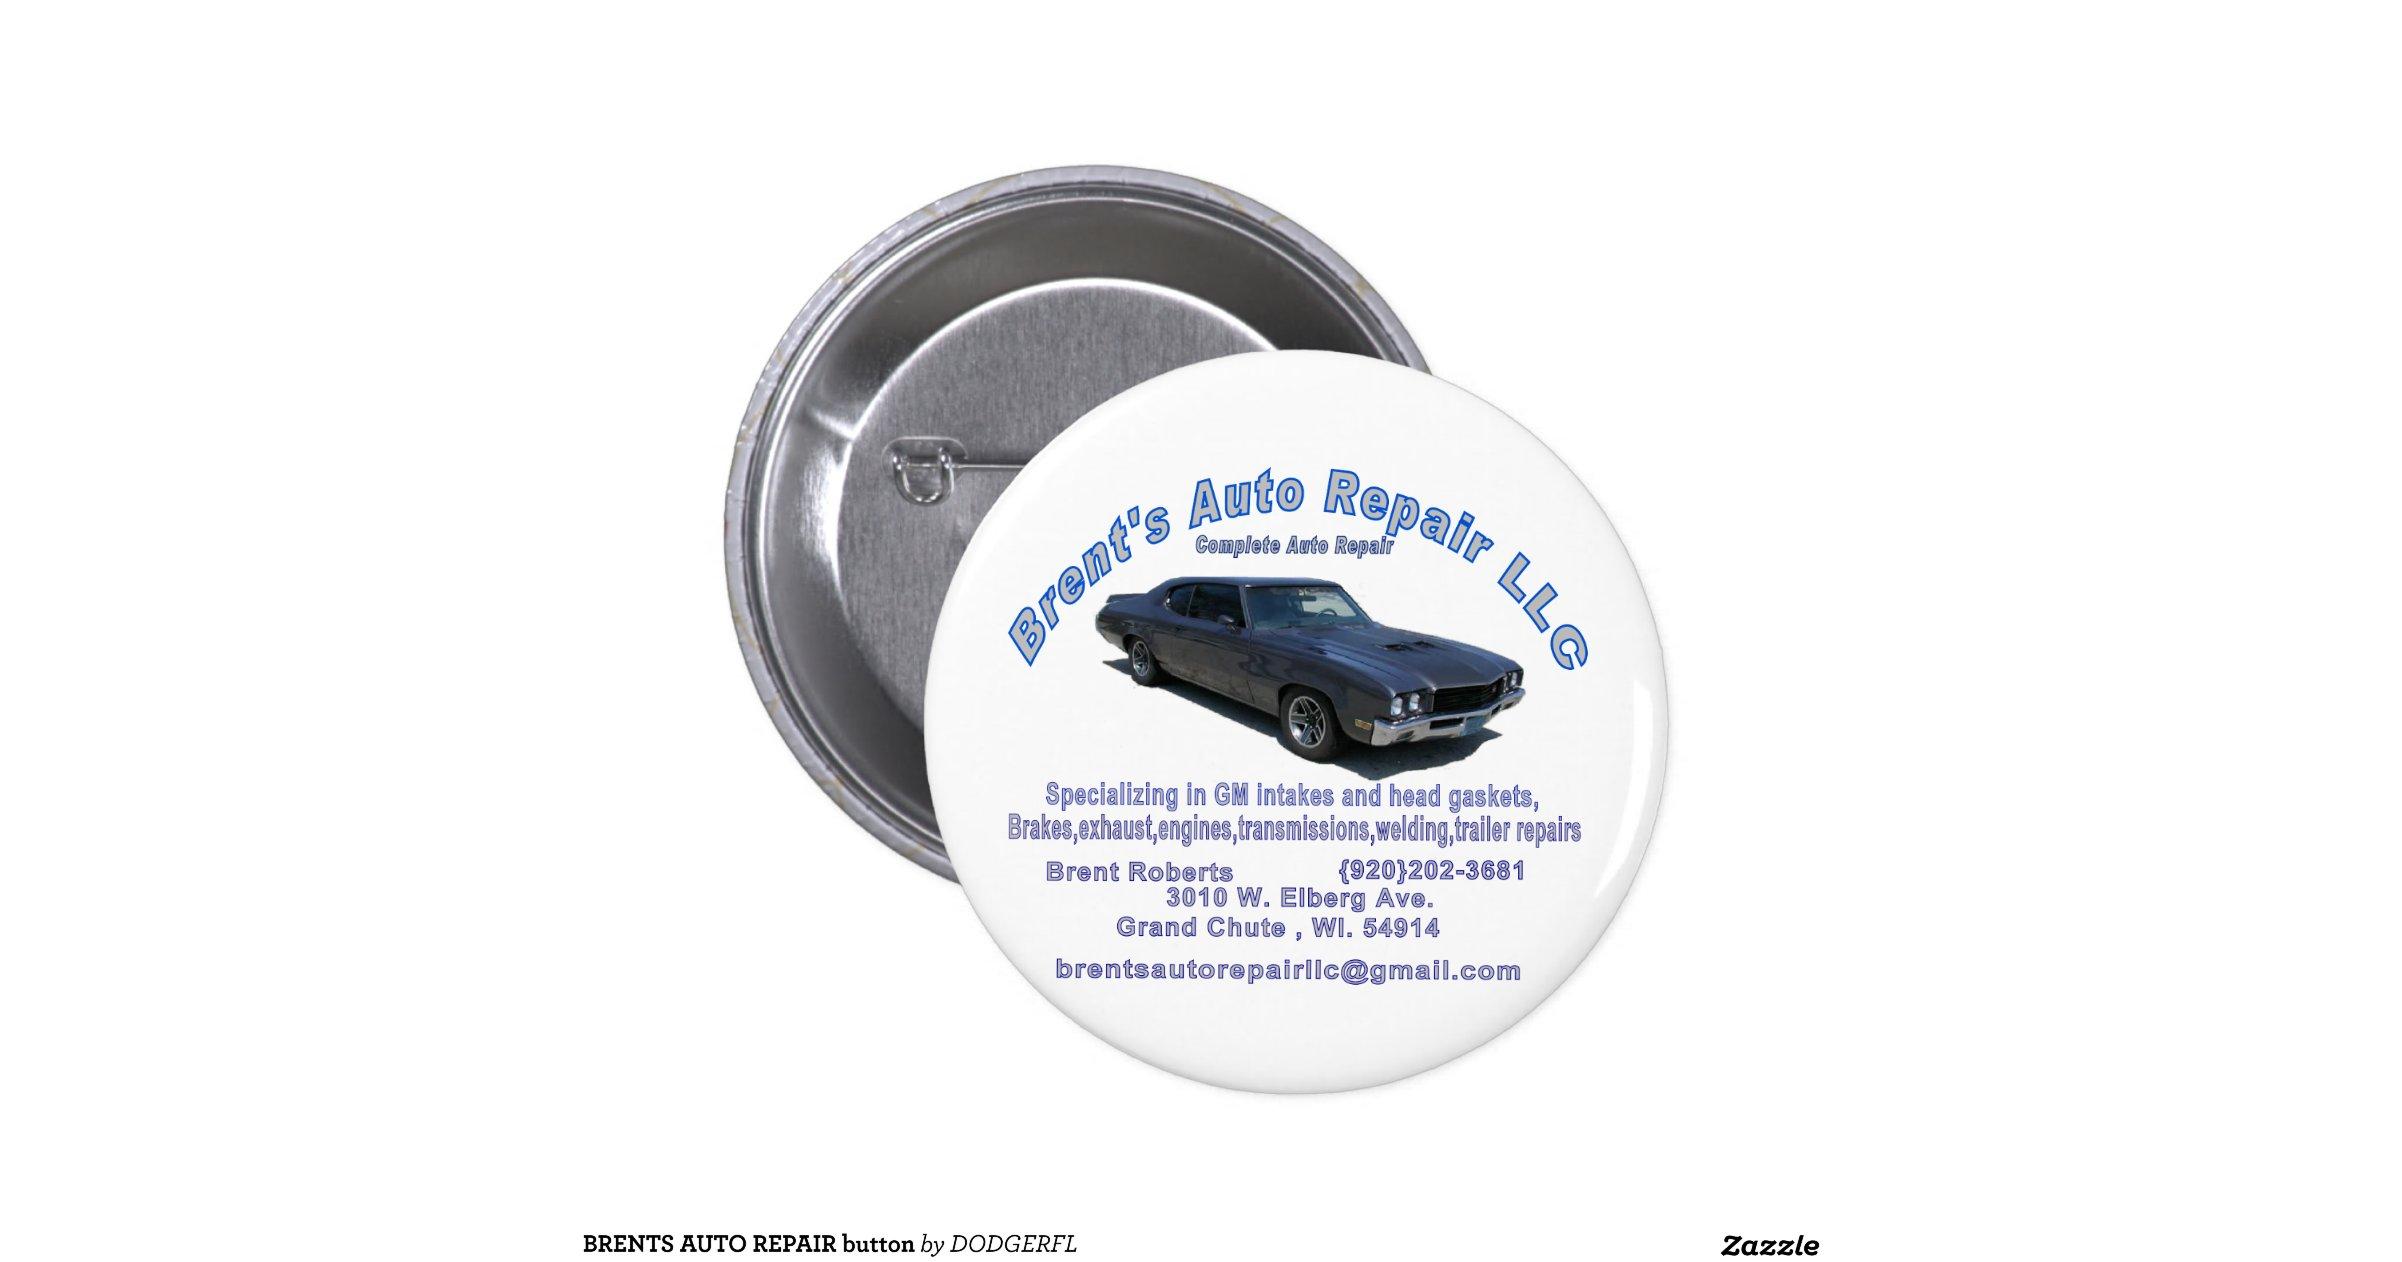 brents auto repair button